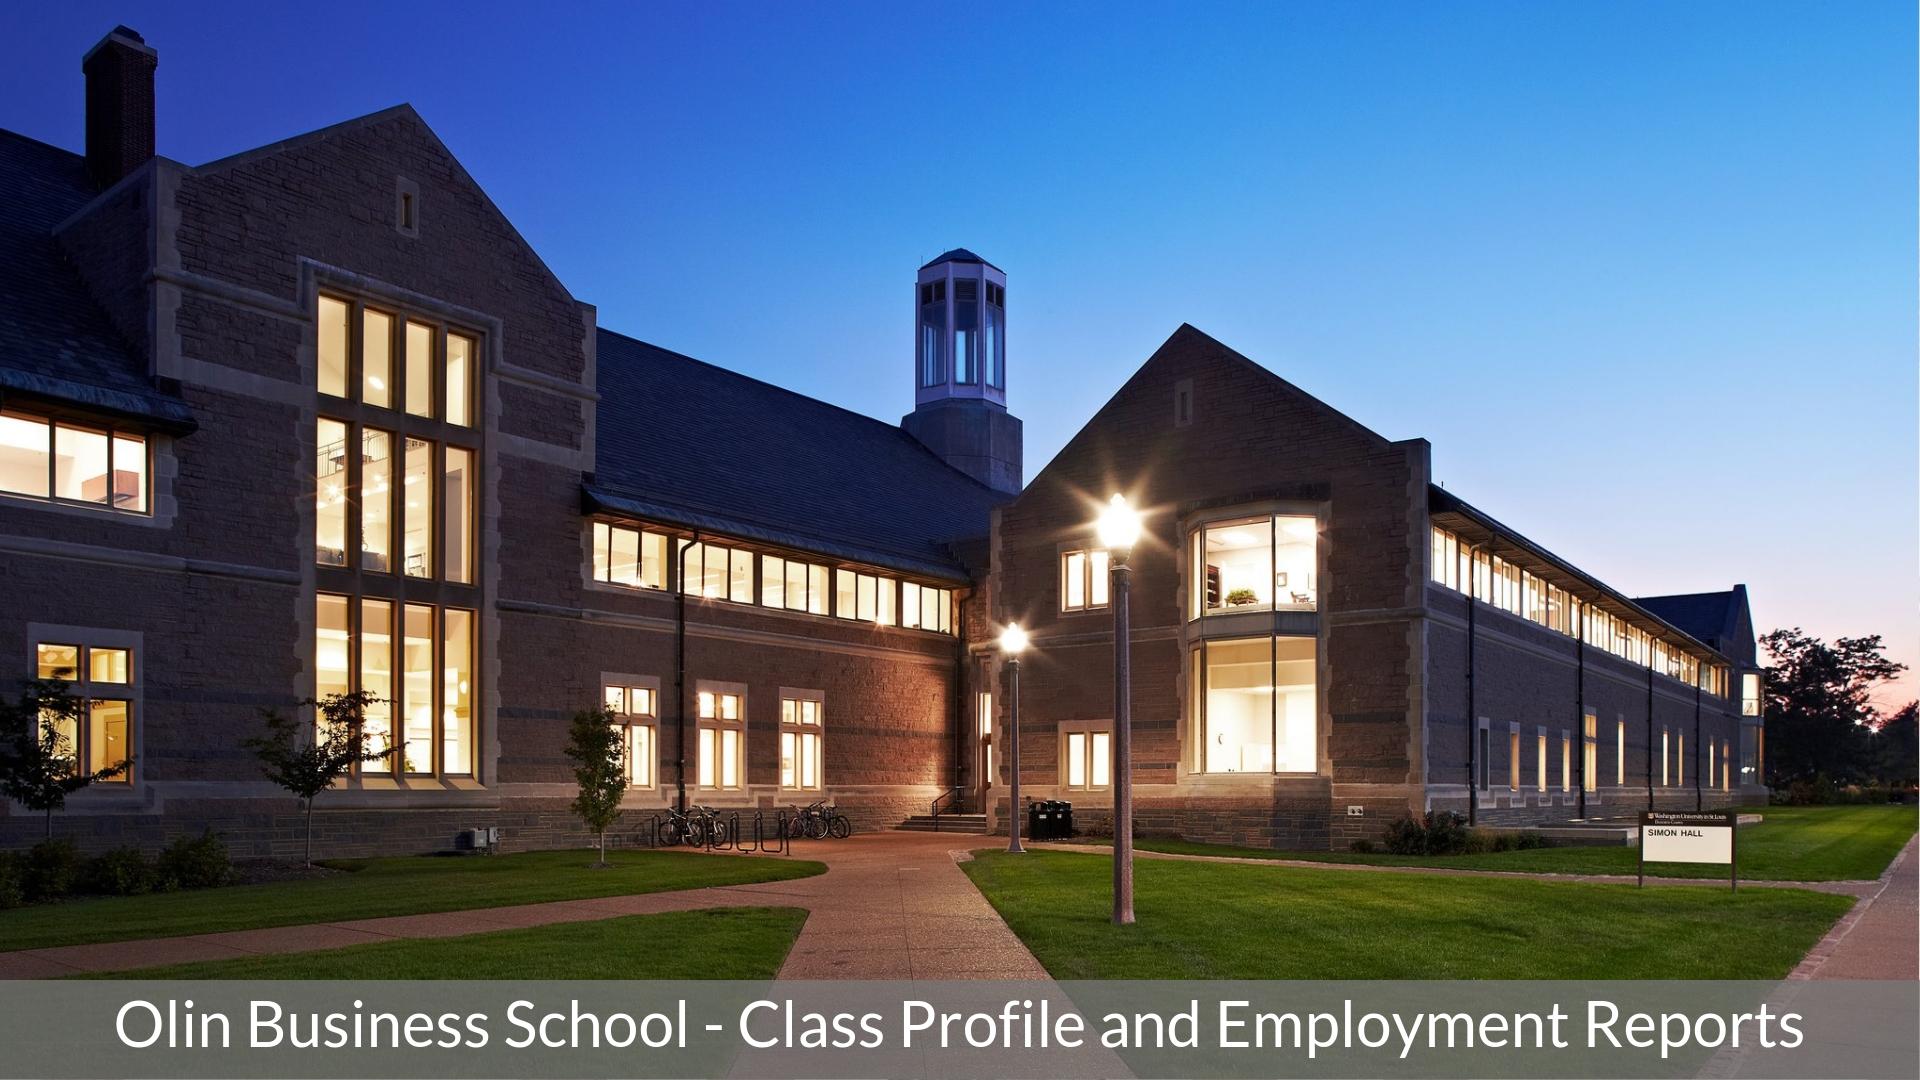 Washington University Olin Business School - Olin MBA Program - Class Profile, Employment Reports and Notable Alumni